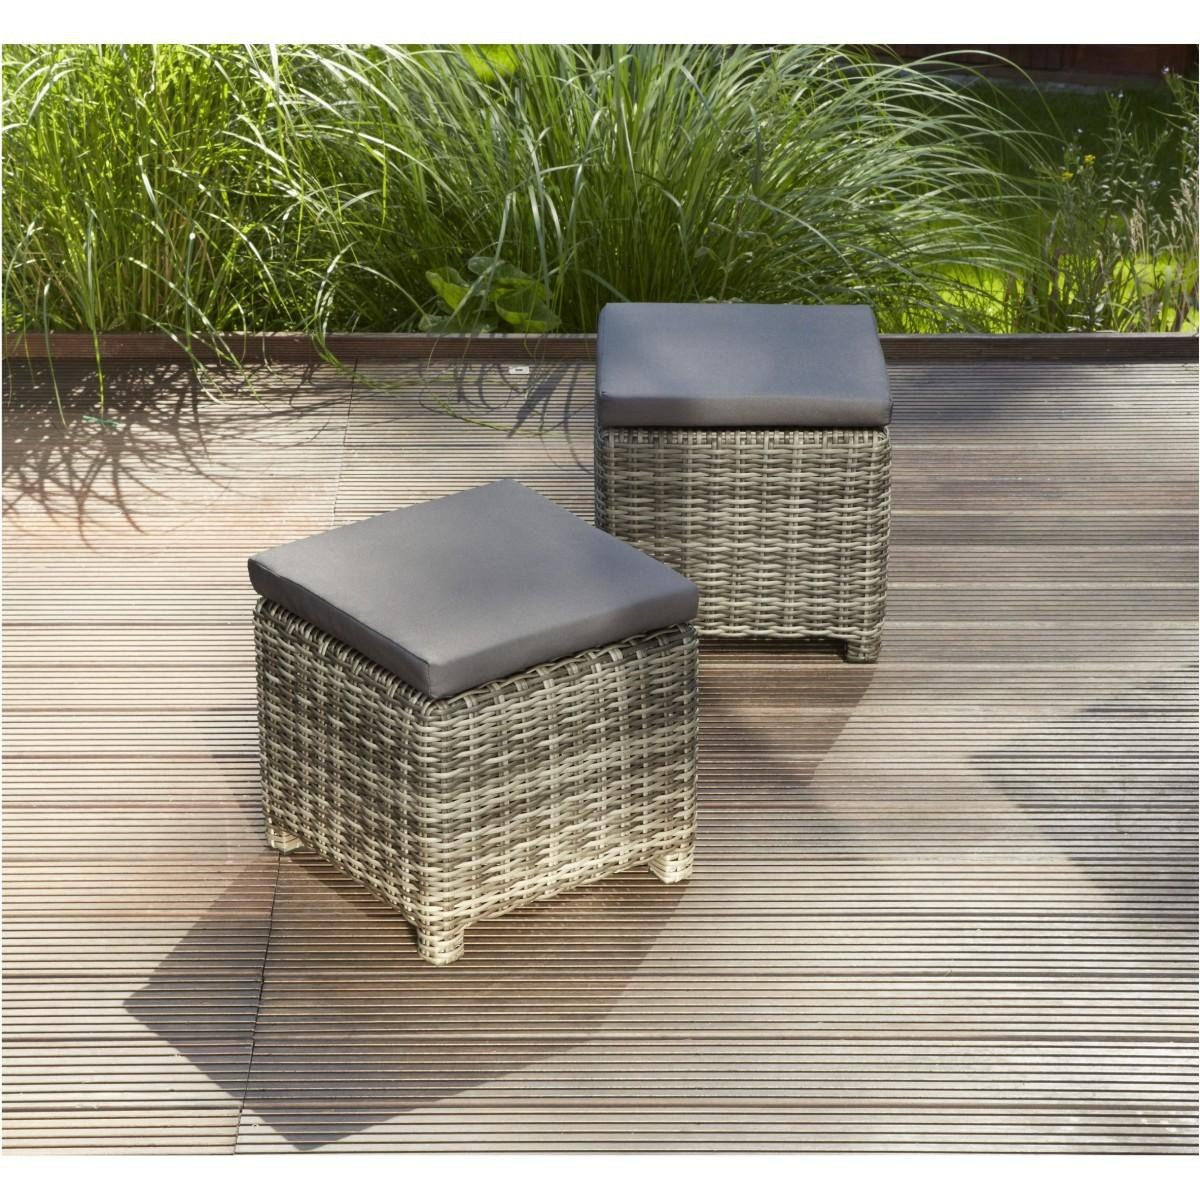 Amazon.de: greemotion Rattan-Lounge Set Miami 6tlg - Design ...